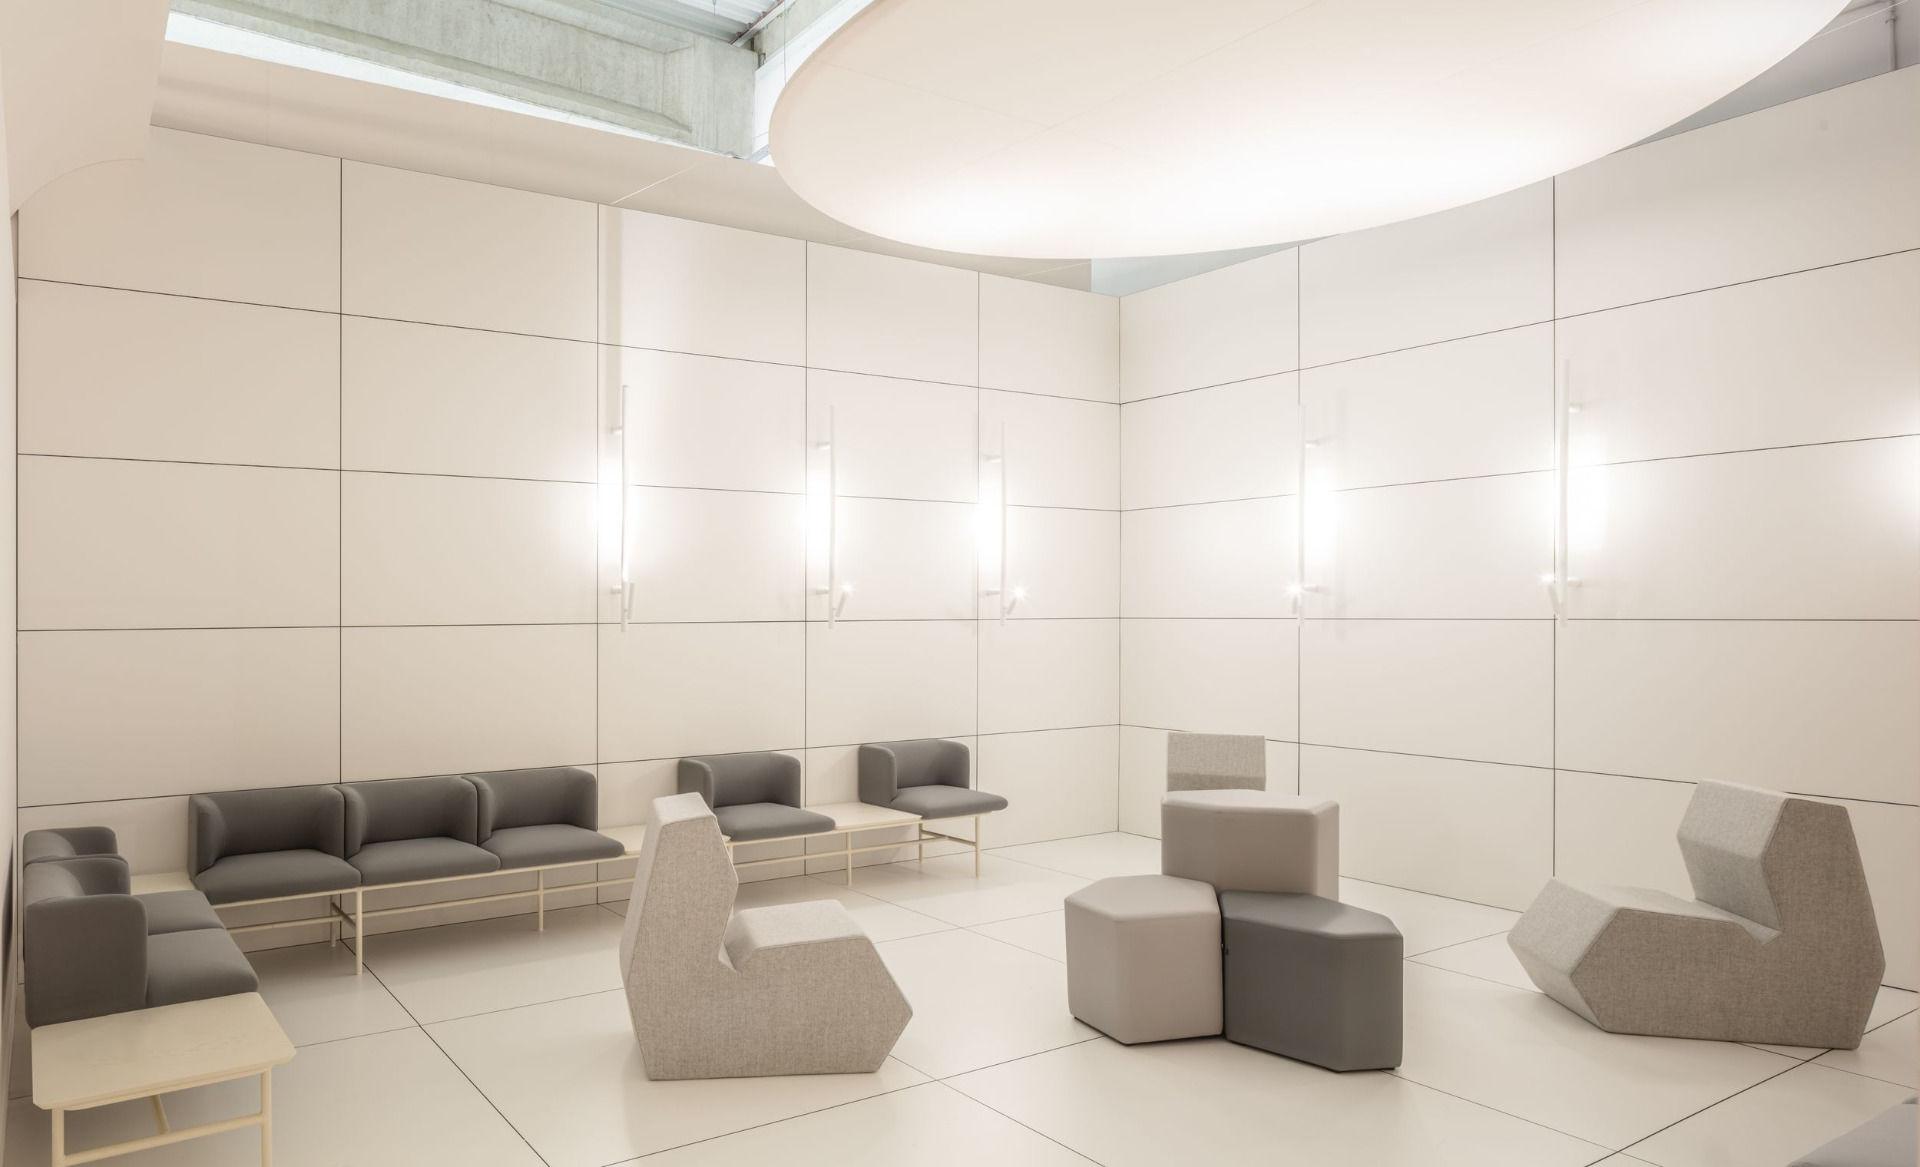 empfangstheken sitzmoebel empfang hotel sitze beige beige raum